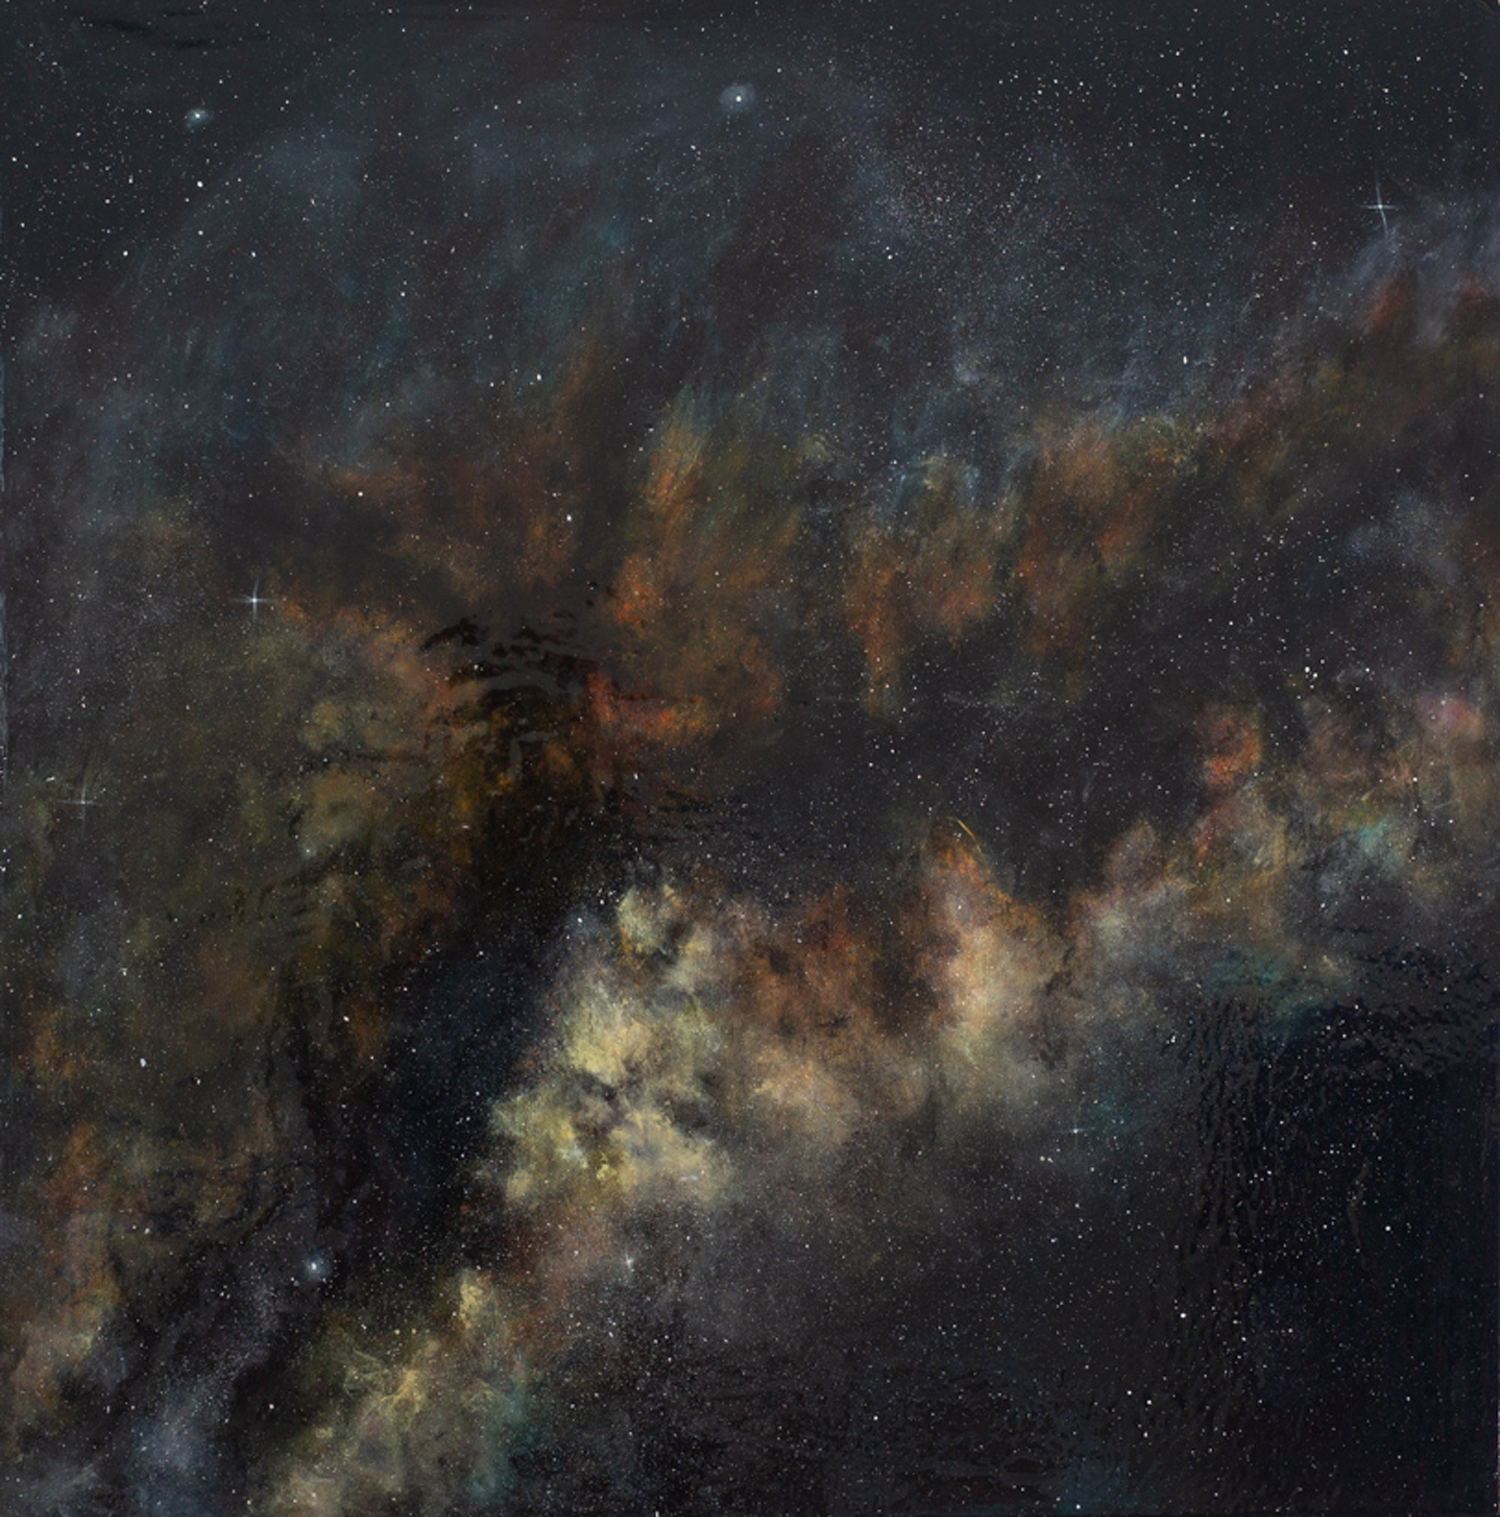 Thumbnail image of Milky Way by Loz Atkinson